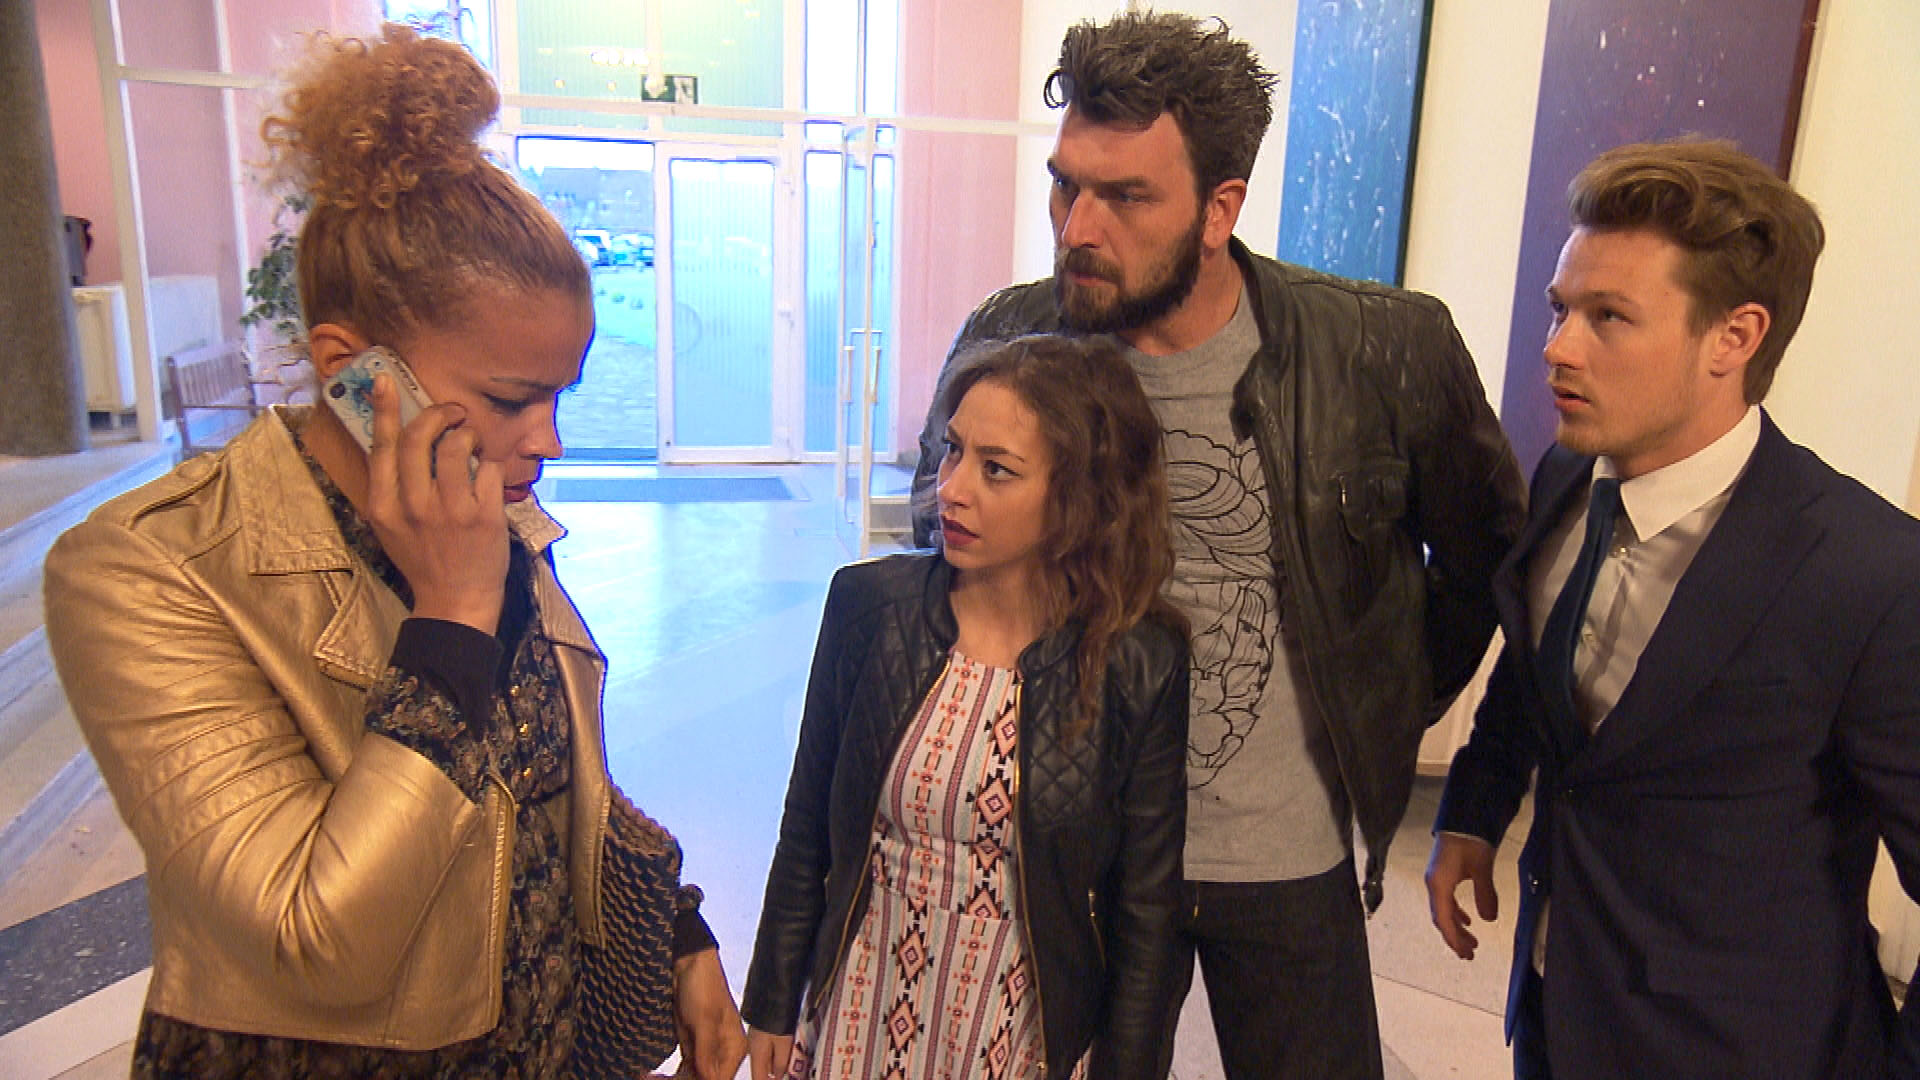 v.li.n.re.: Sam, Elli, Alex, Valentin (Quelle: RTL 2)